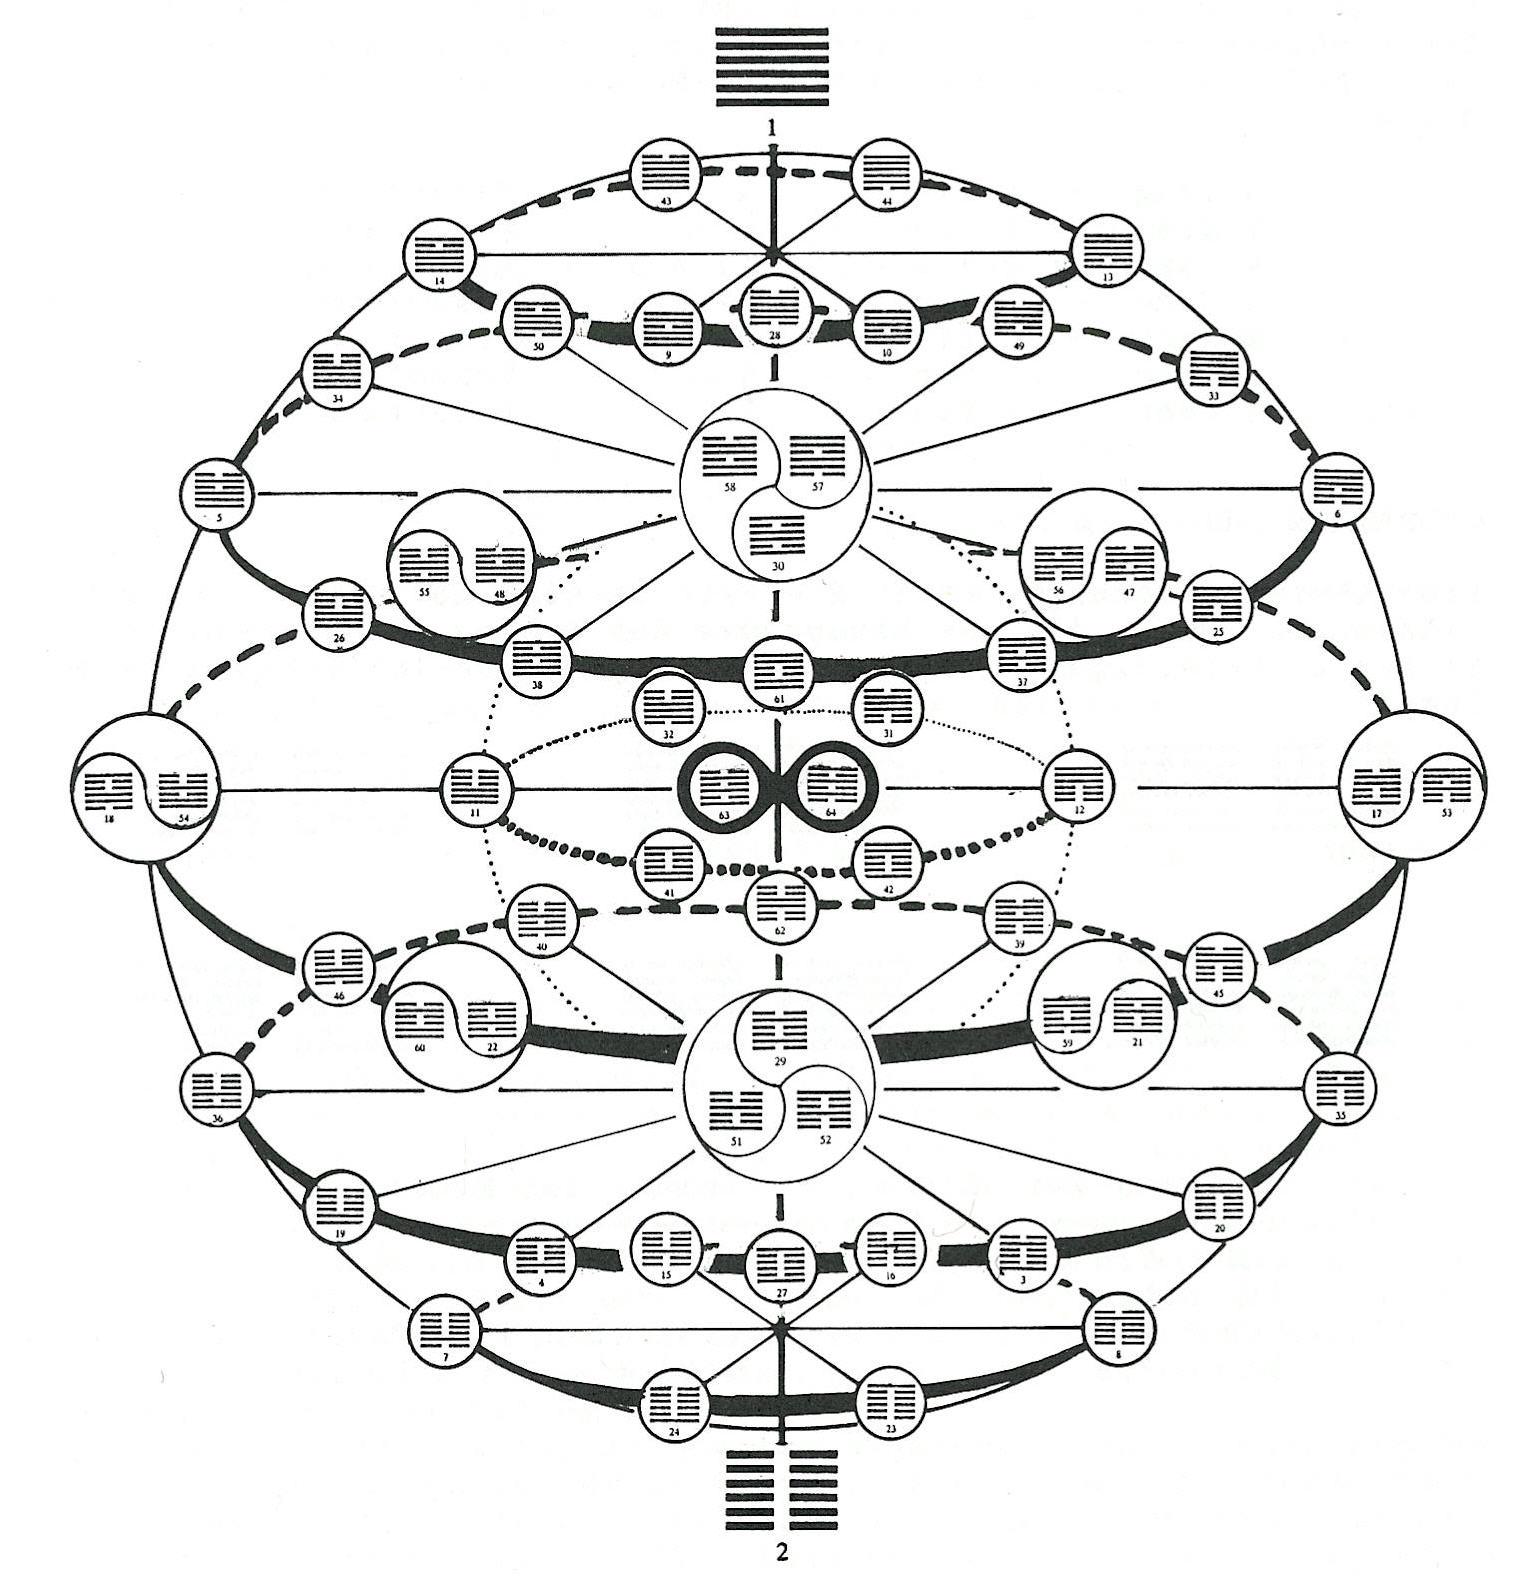 http://1.bp.blogspot.com/_UeF6xEoVkT4/TB6CEv2yHrI/AAAAAAAABS0/HyavgVjEaLQ/s1600/knowledge-iching-sphere-full.jpg